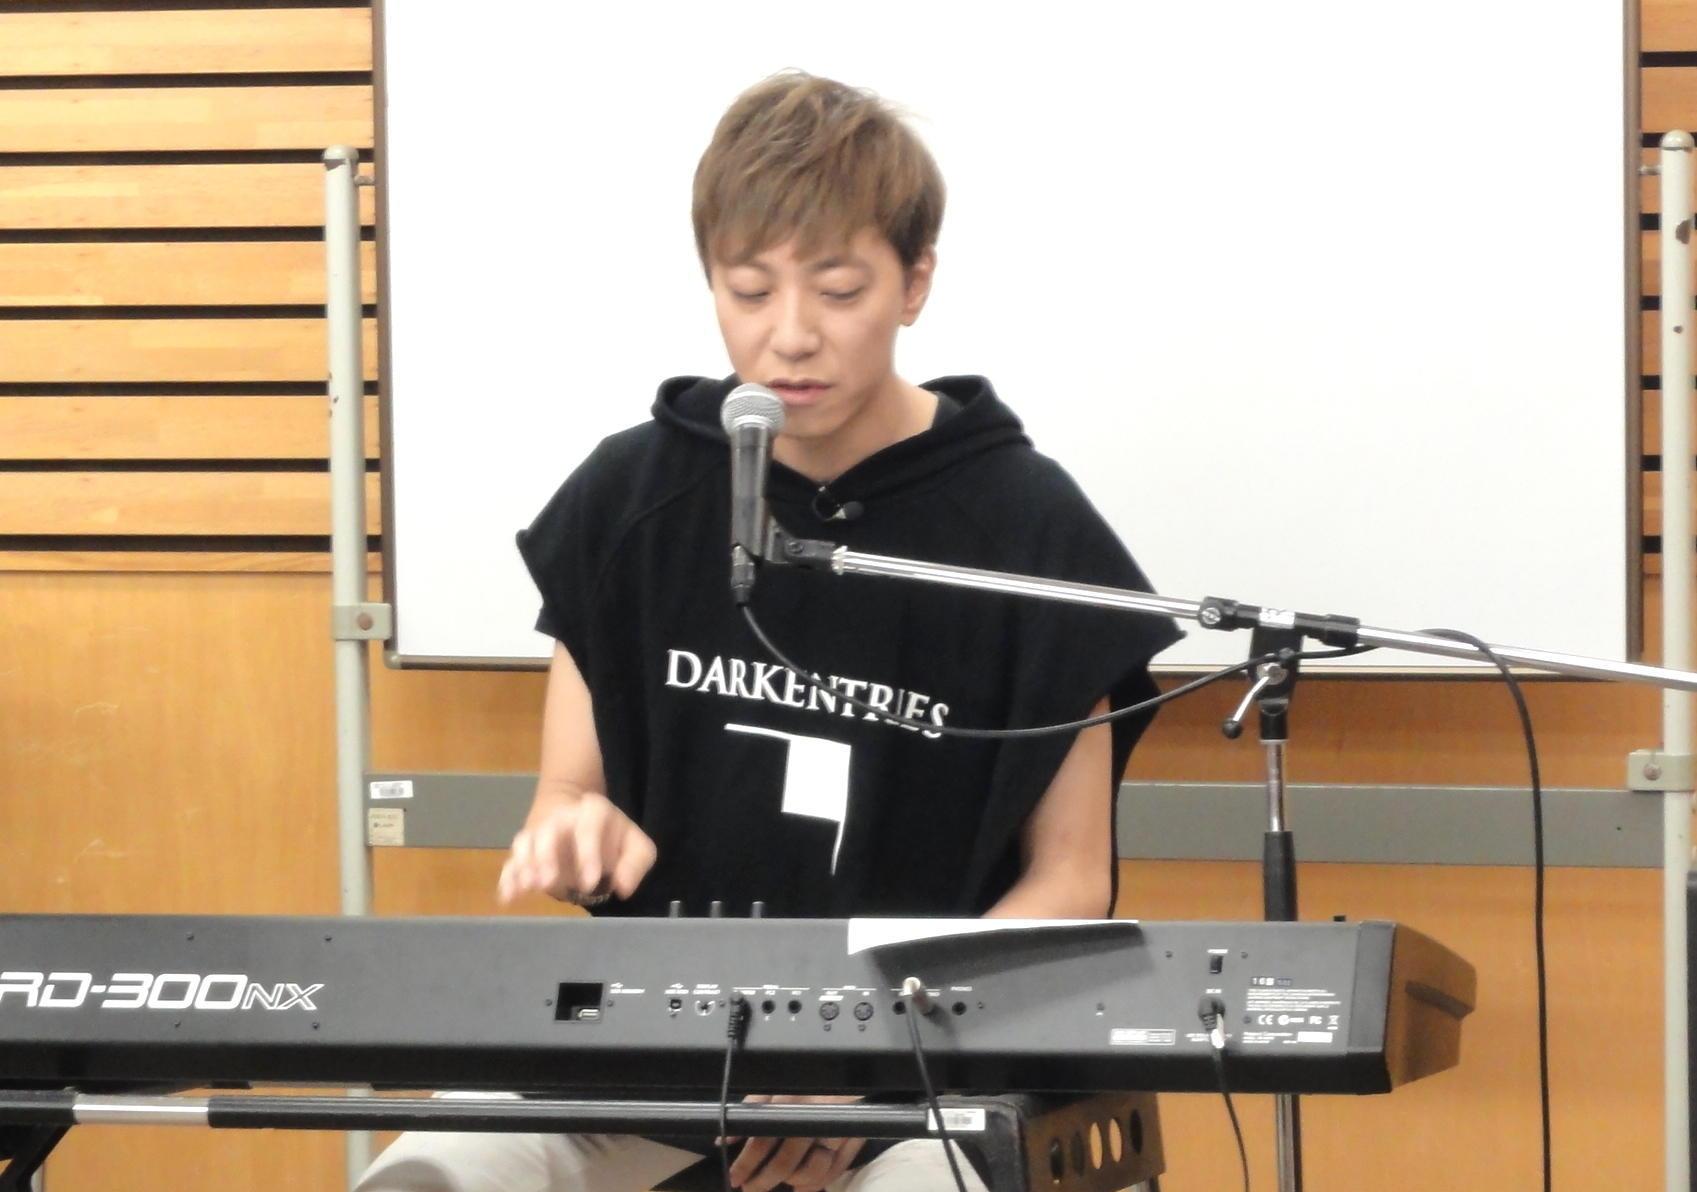 http://news.yoshimoto.co.jp/20170727165955-39e57fc05811abbd44d6e15ded5f8bc2f4954f30.jpg